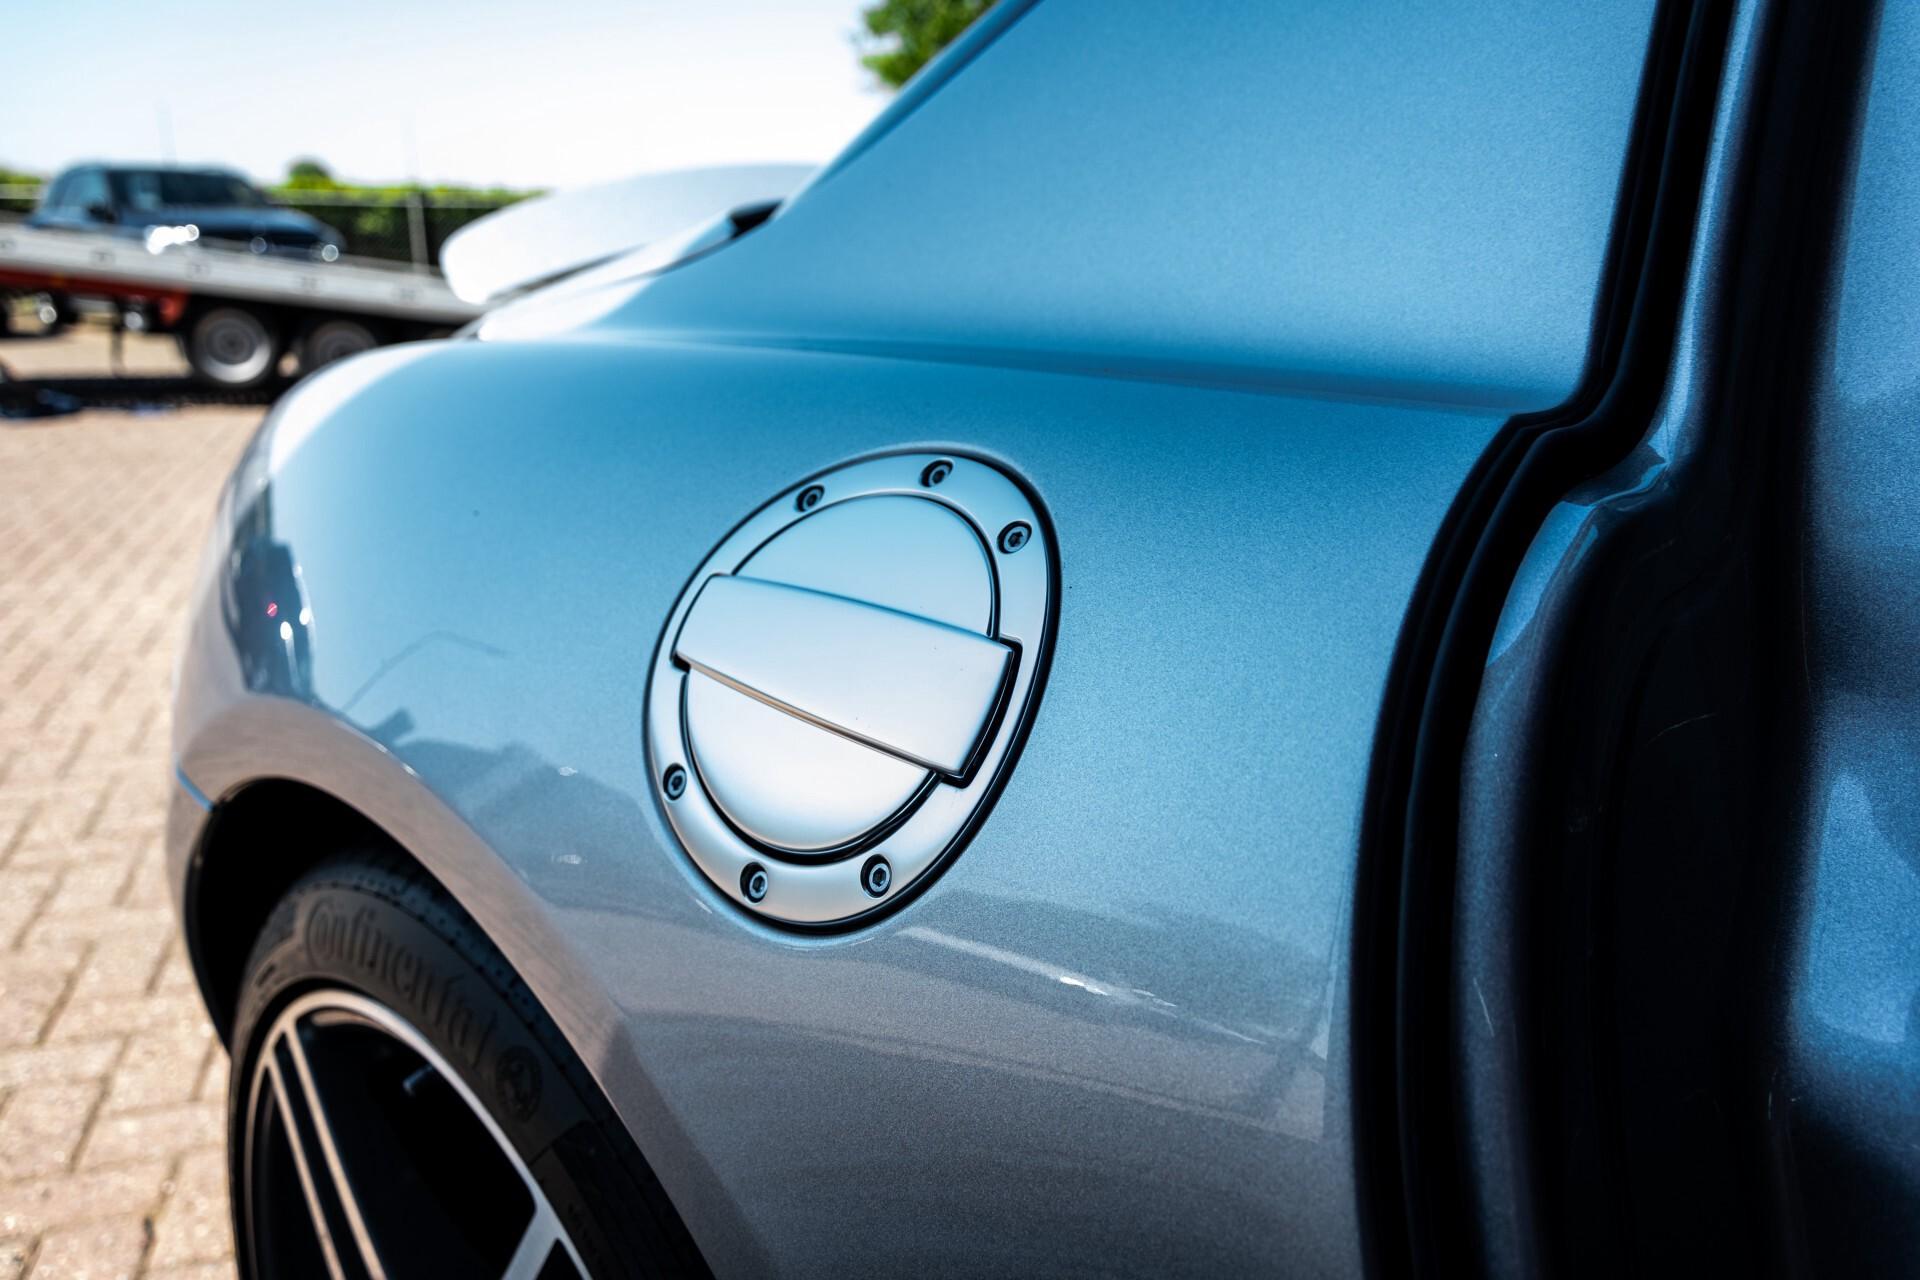 Mercedes-Benz SLS-Klasse Coupe 6.3 AMG 1ste eigenaar/NL Auto FULL OPTIONS Aut7 Foto 51